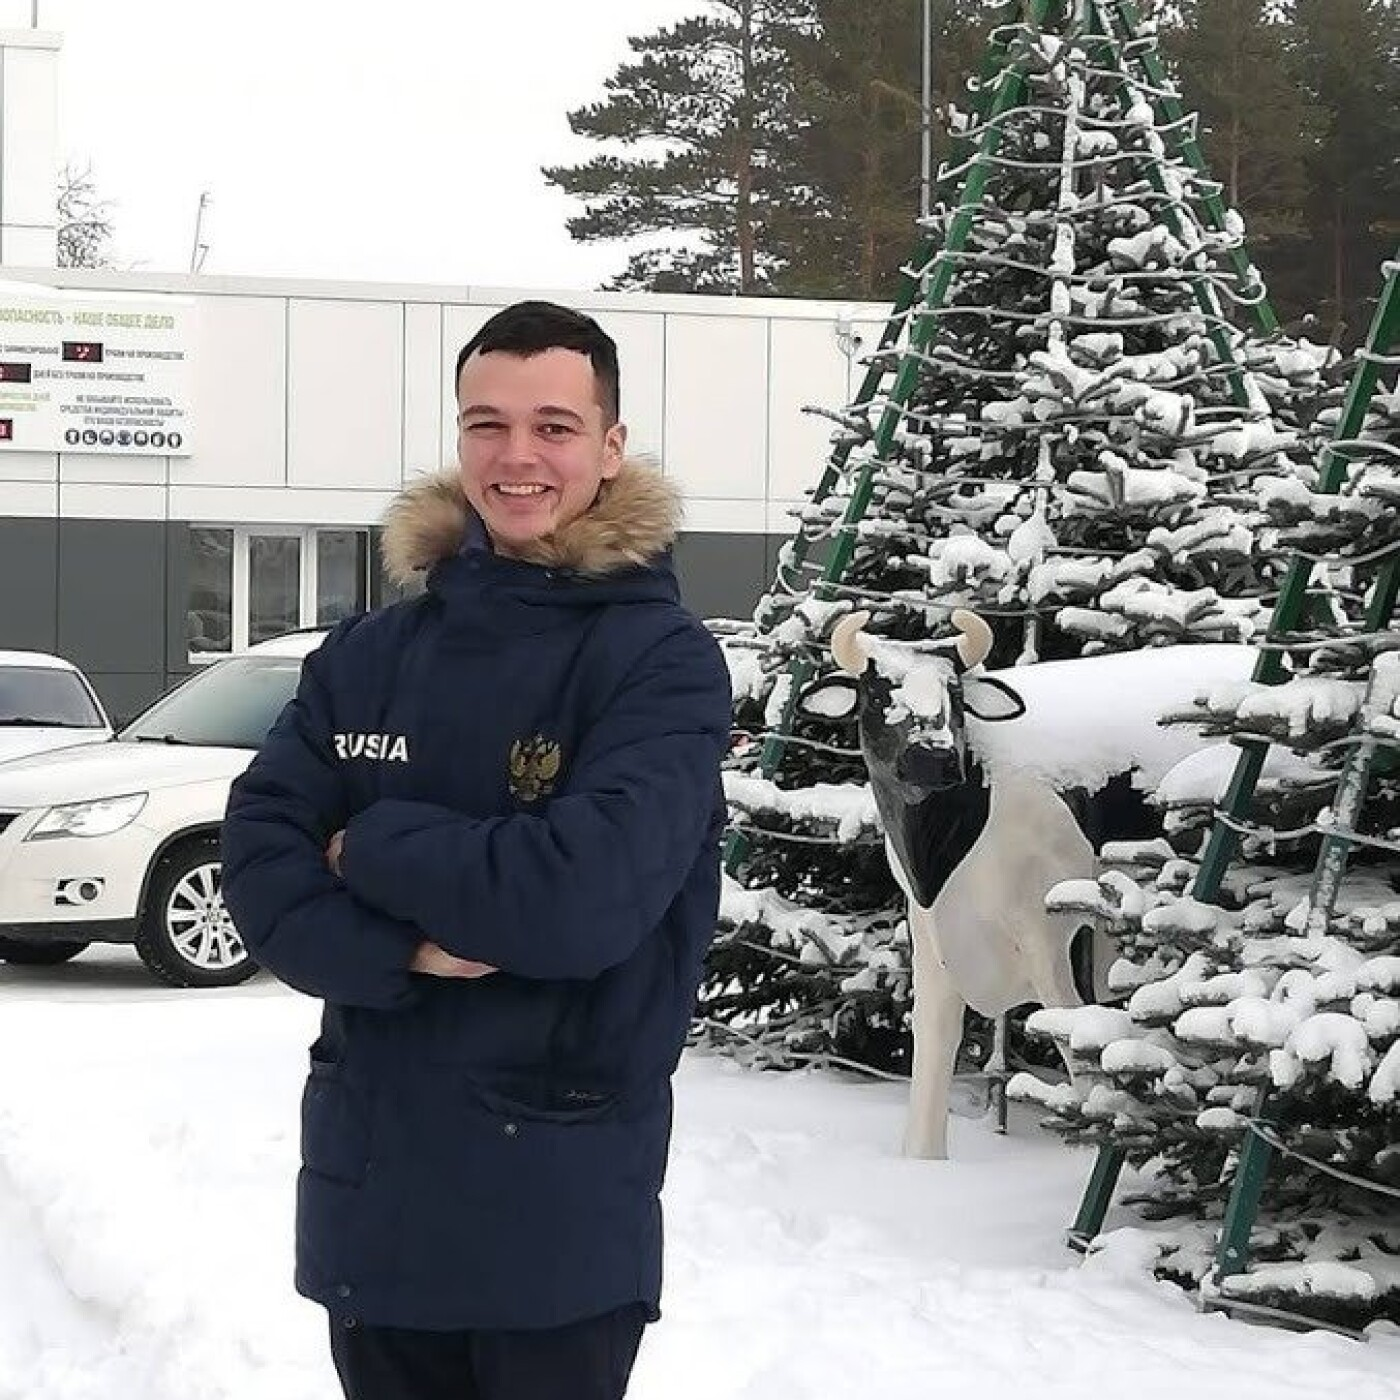 Julien vit depuis 2 ans a Oufa, dans la campagne Russe - 21 01 2021 - StereoChic Radio